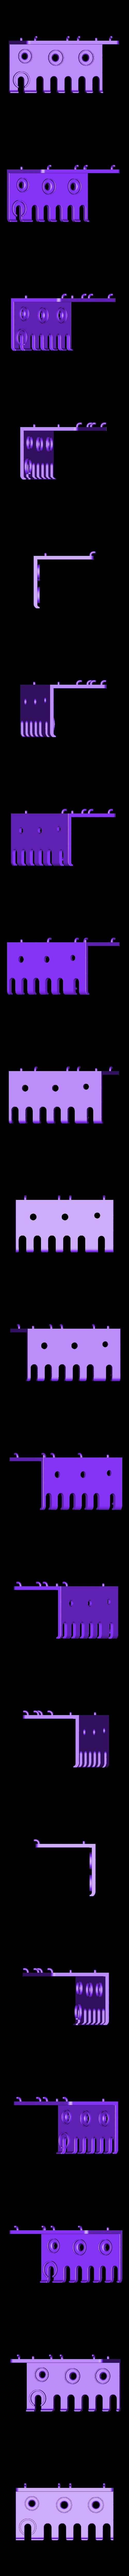 Left_Pins.stl Download free STL file Tool Holder for 18pcs Screwdriver Set 059 I for screws or peg board • 3D printing template, Wiesemann1893